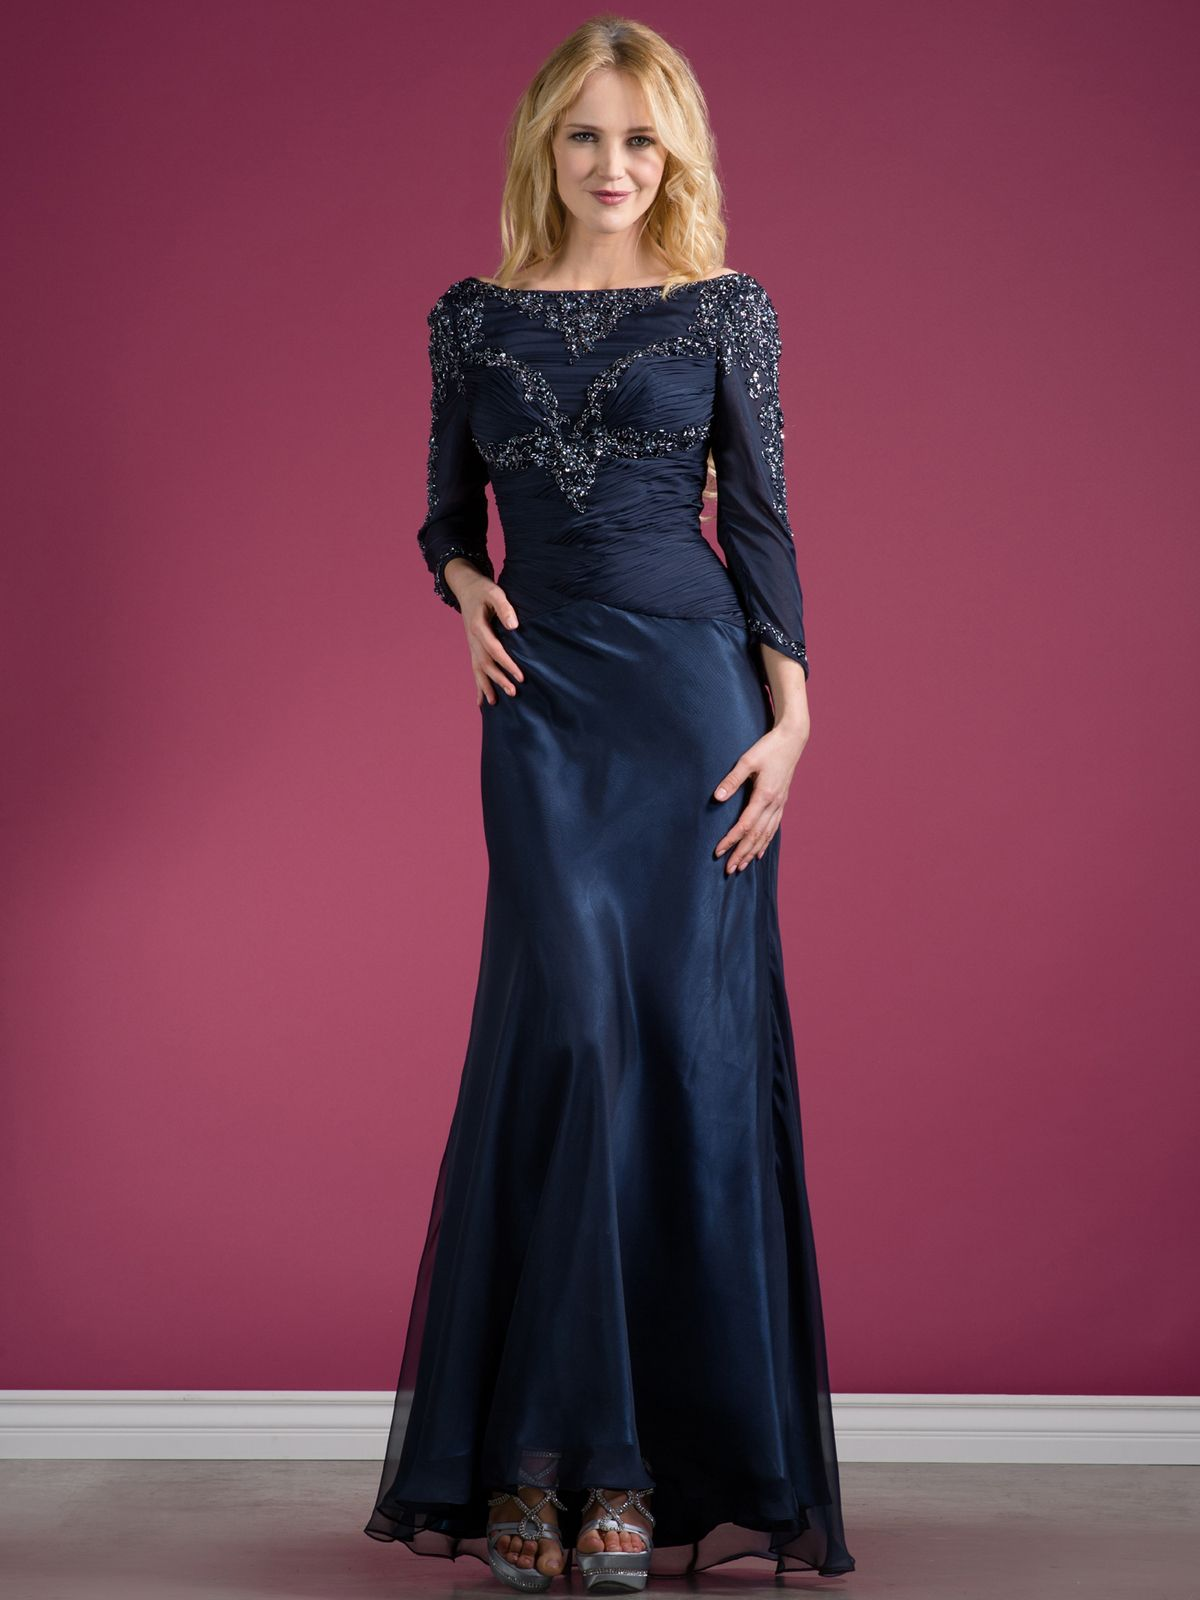 Amazing long sleeve evening dresses navy beaded long sleeve